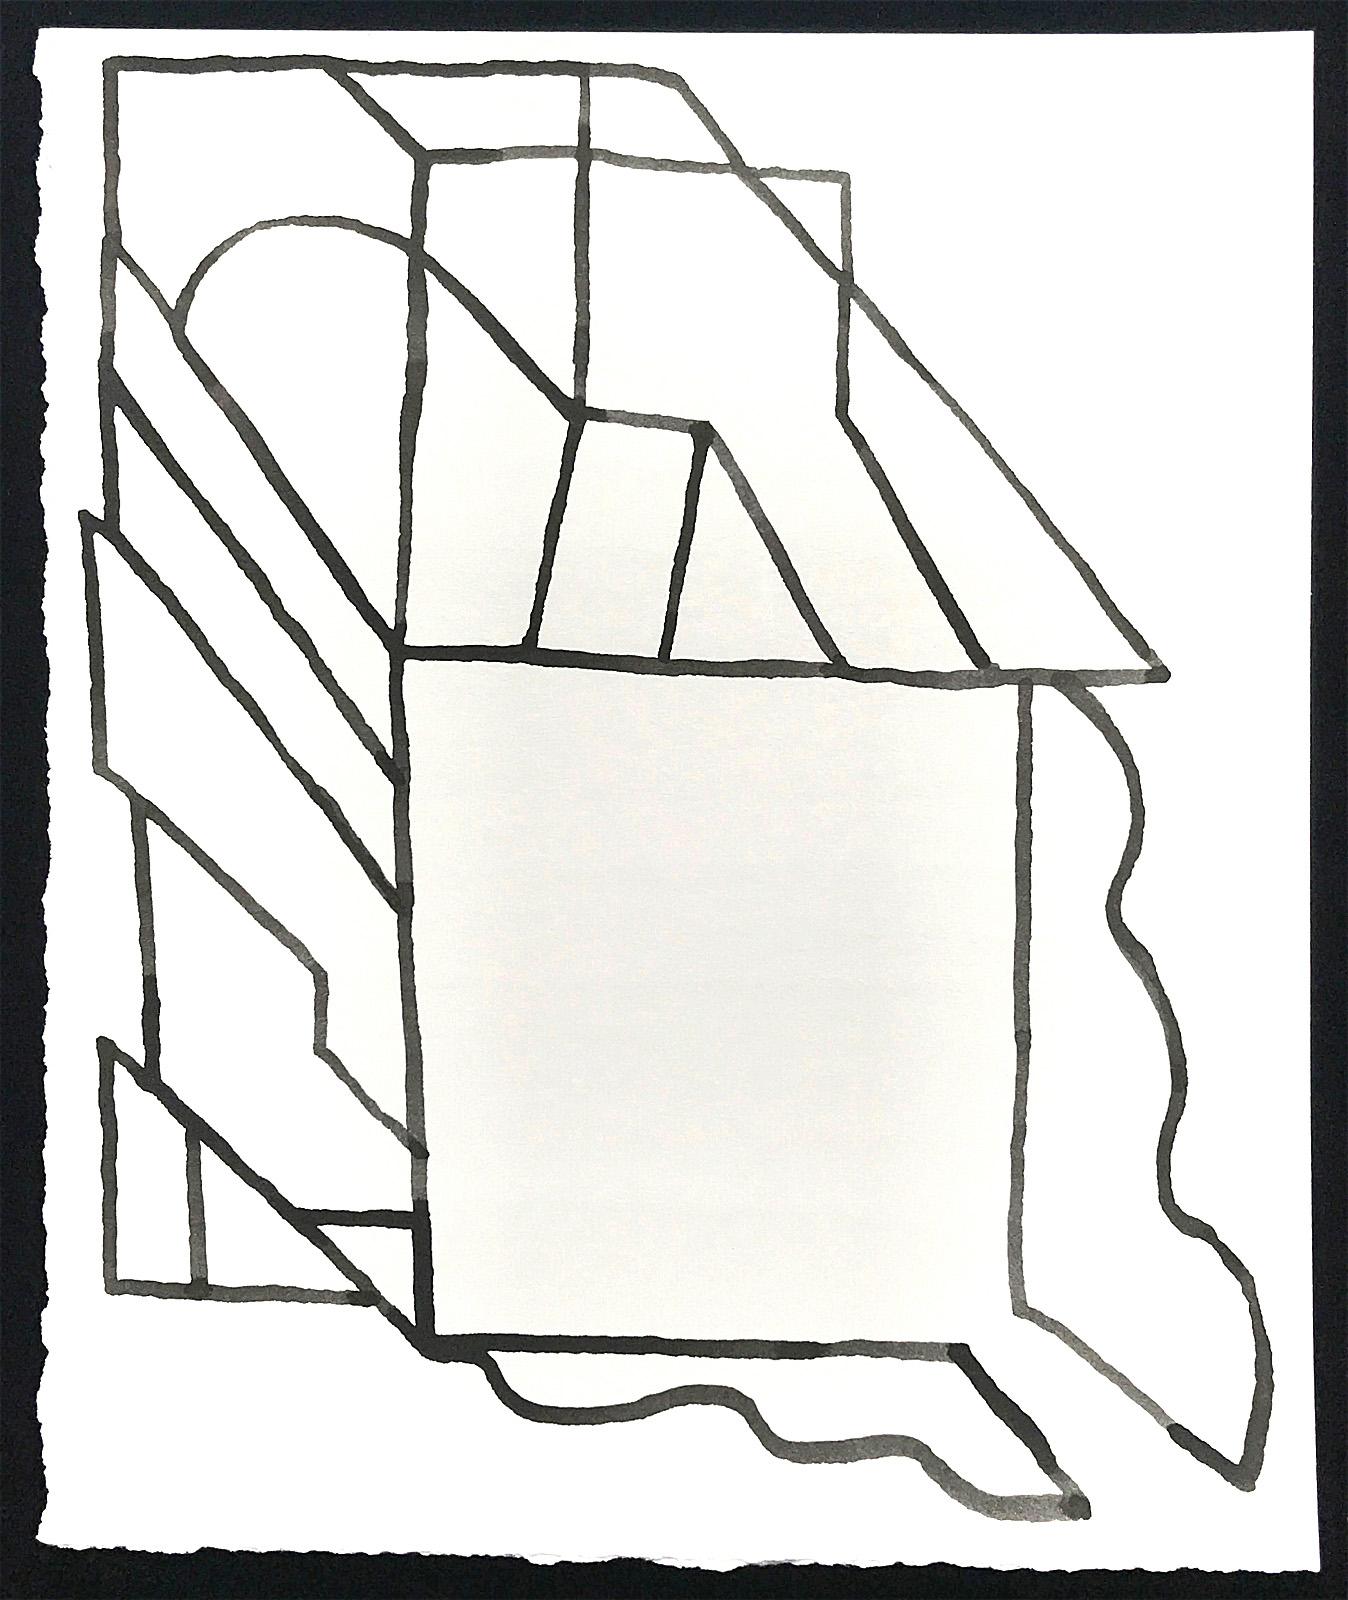 O.T., 23 x 18 cm